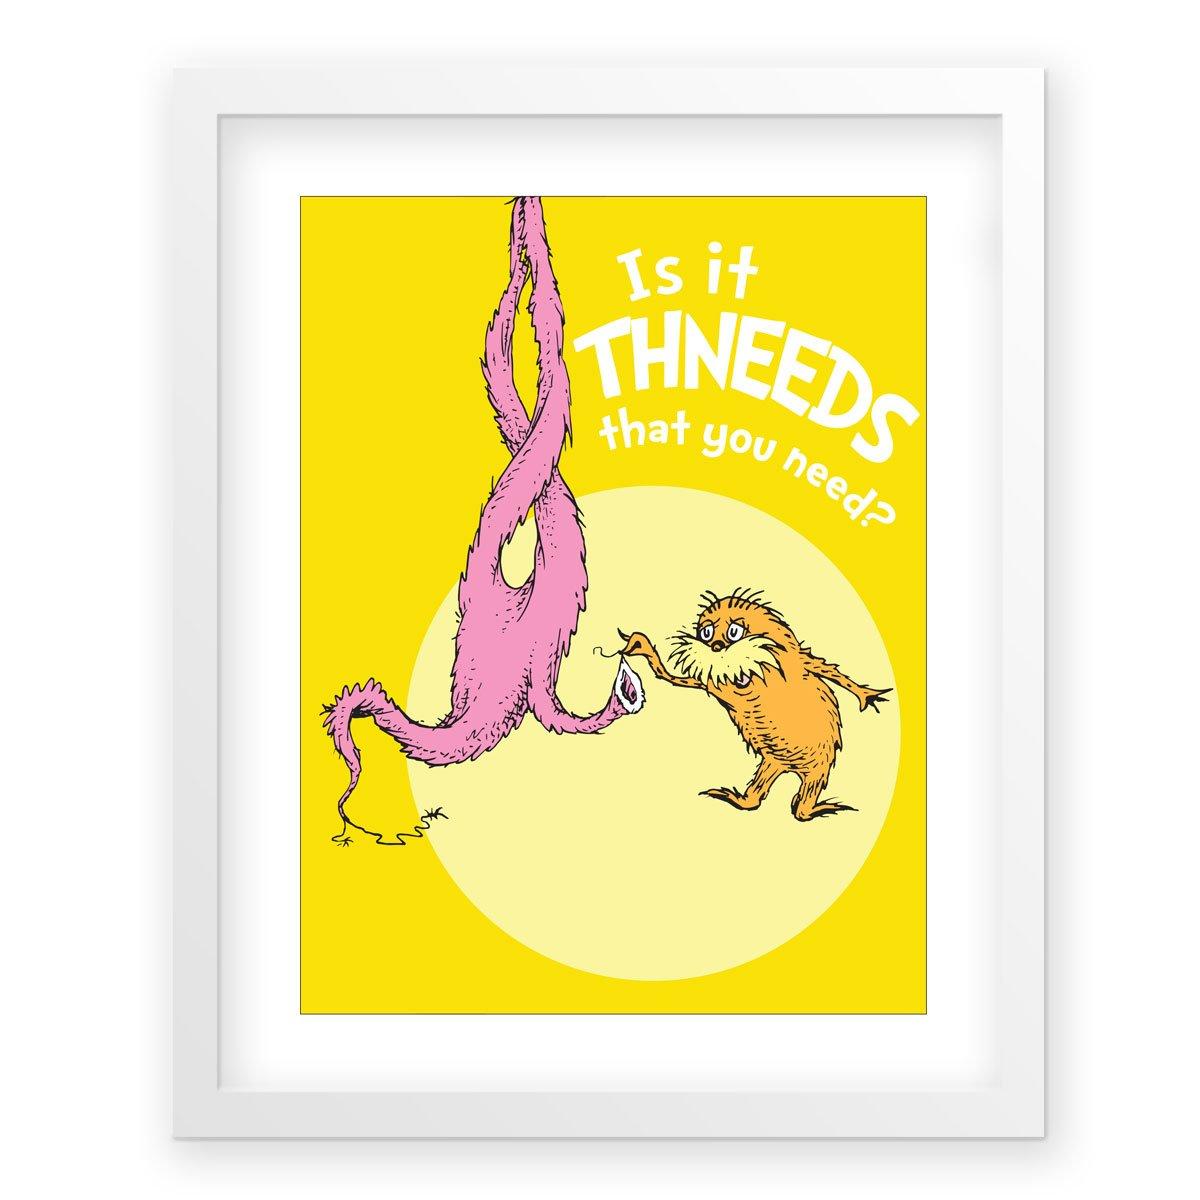 Amazon.com: Is It Thneeds?, yellow - E121f, framed Dr. Seuss ...